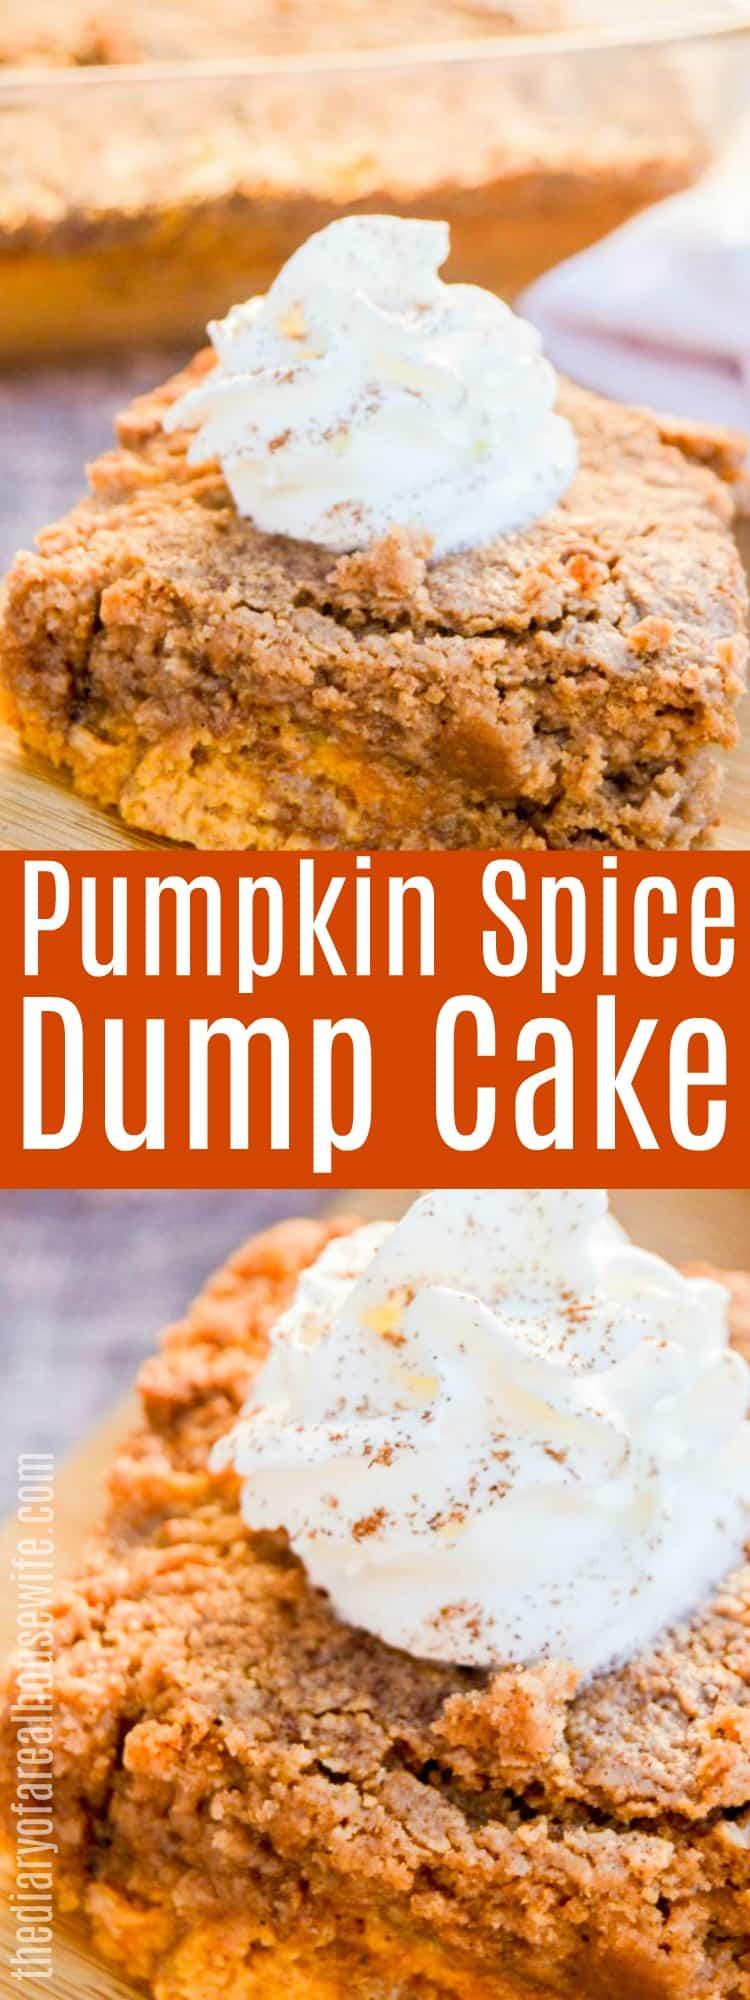 Pumpkin Spice Dump Cake